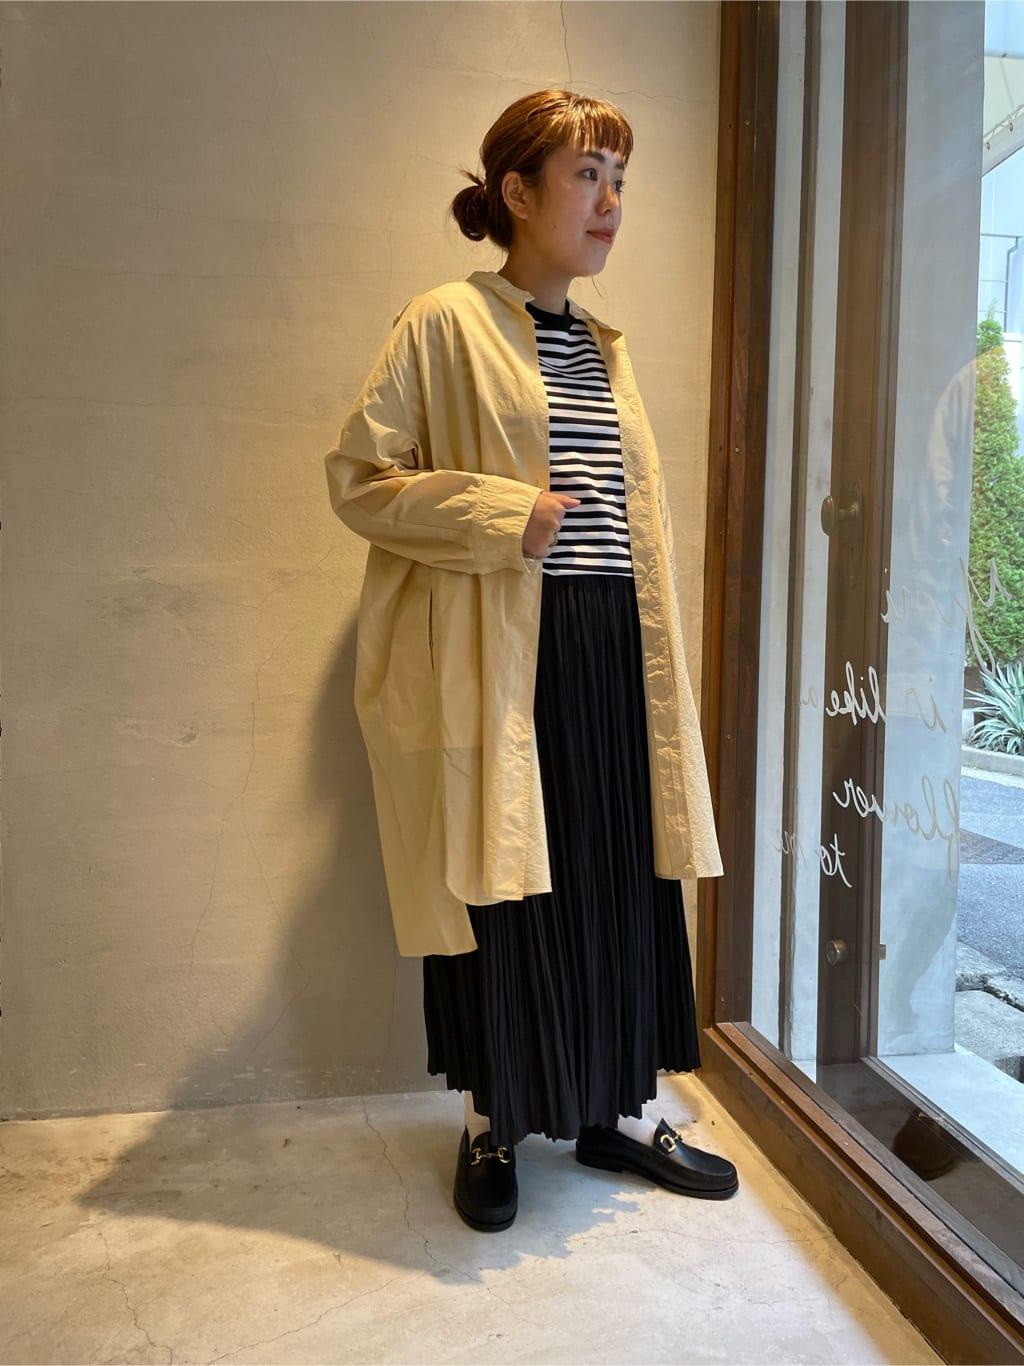 yuni 神戸路面 身長:154cm 2021.09.27